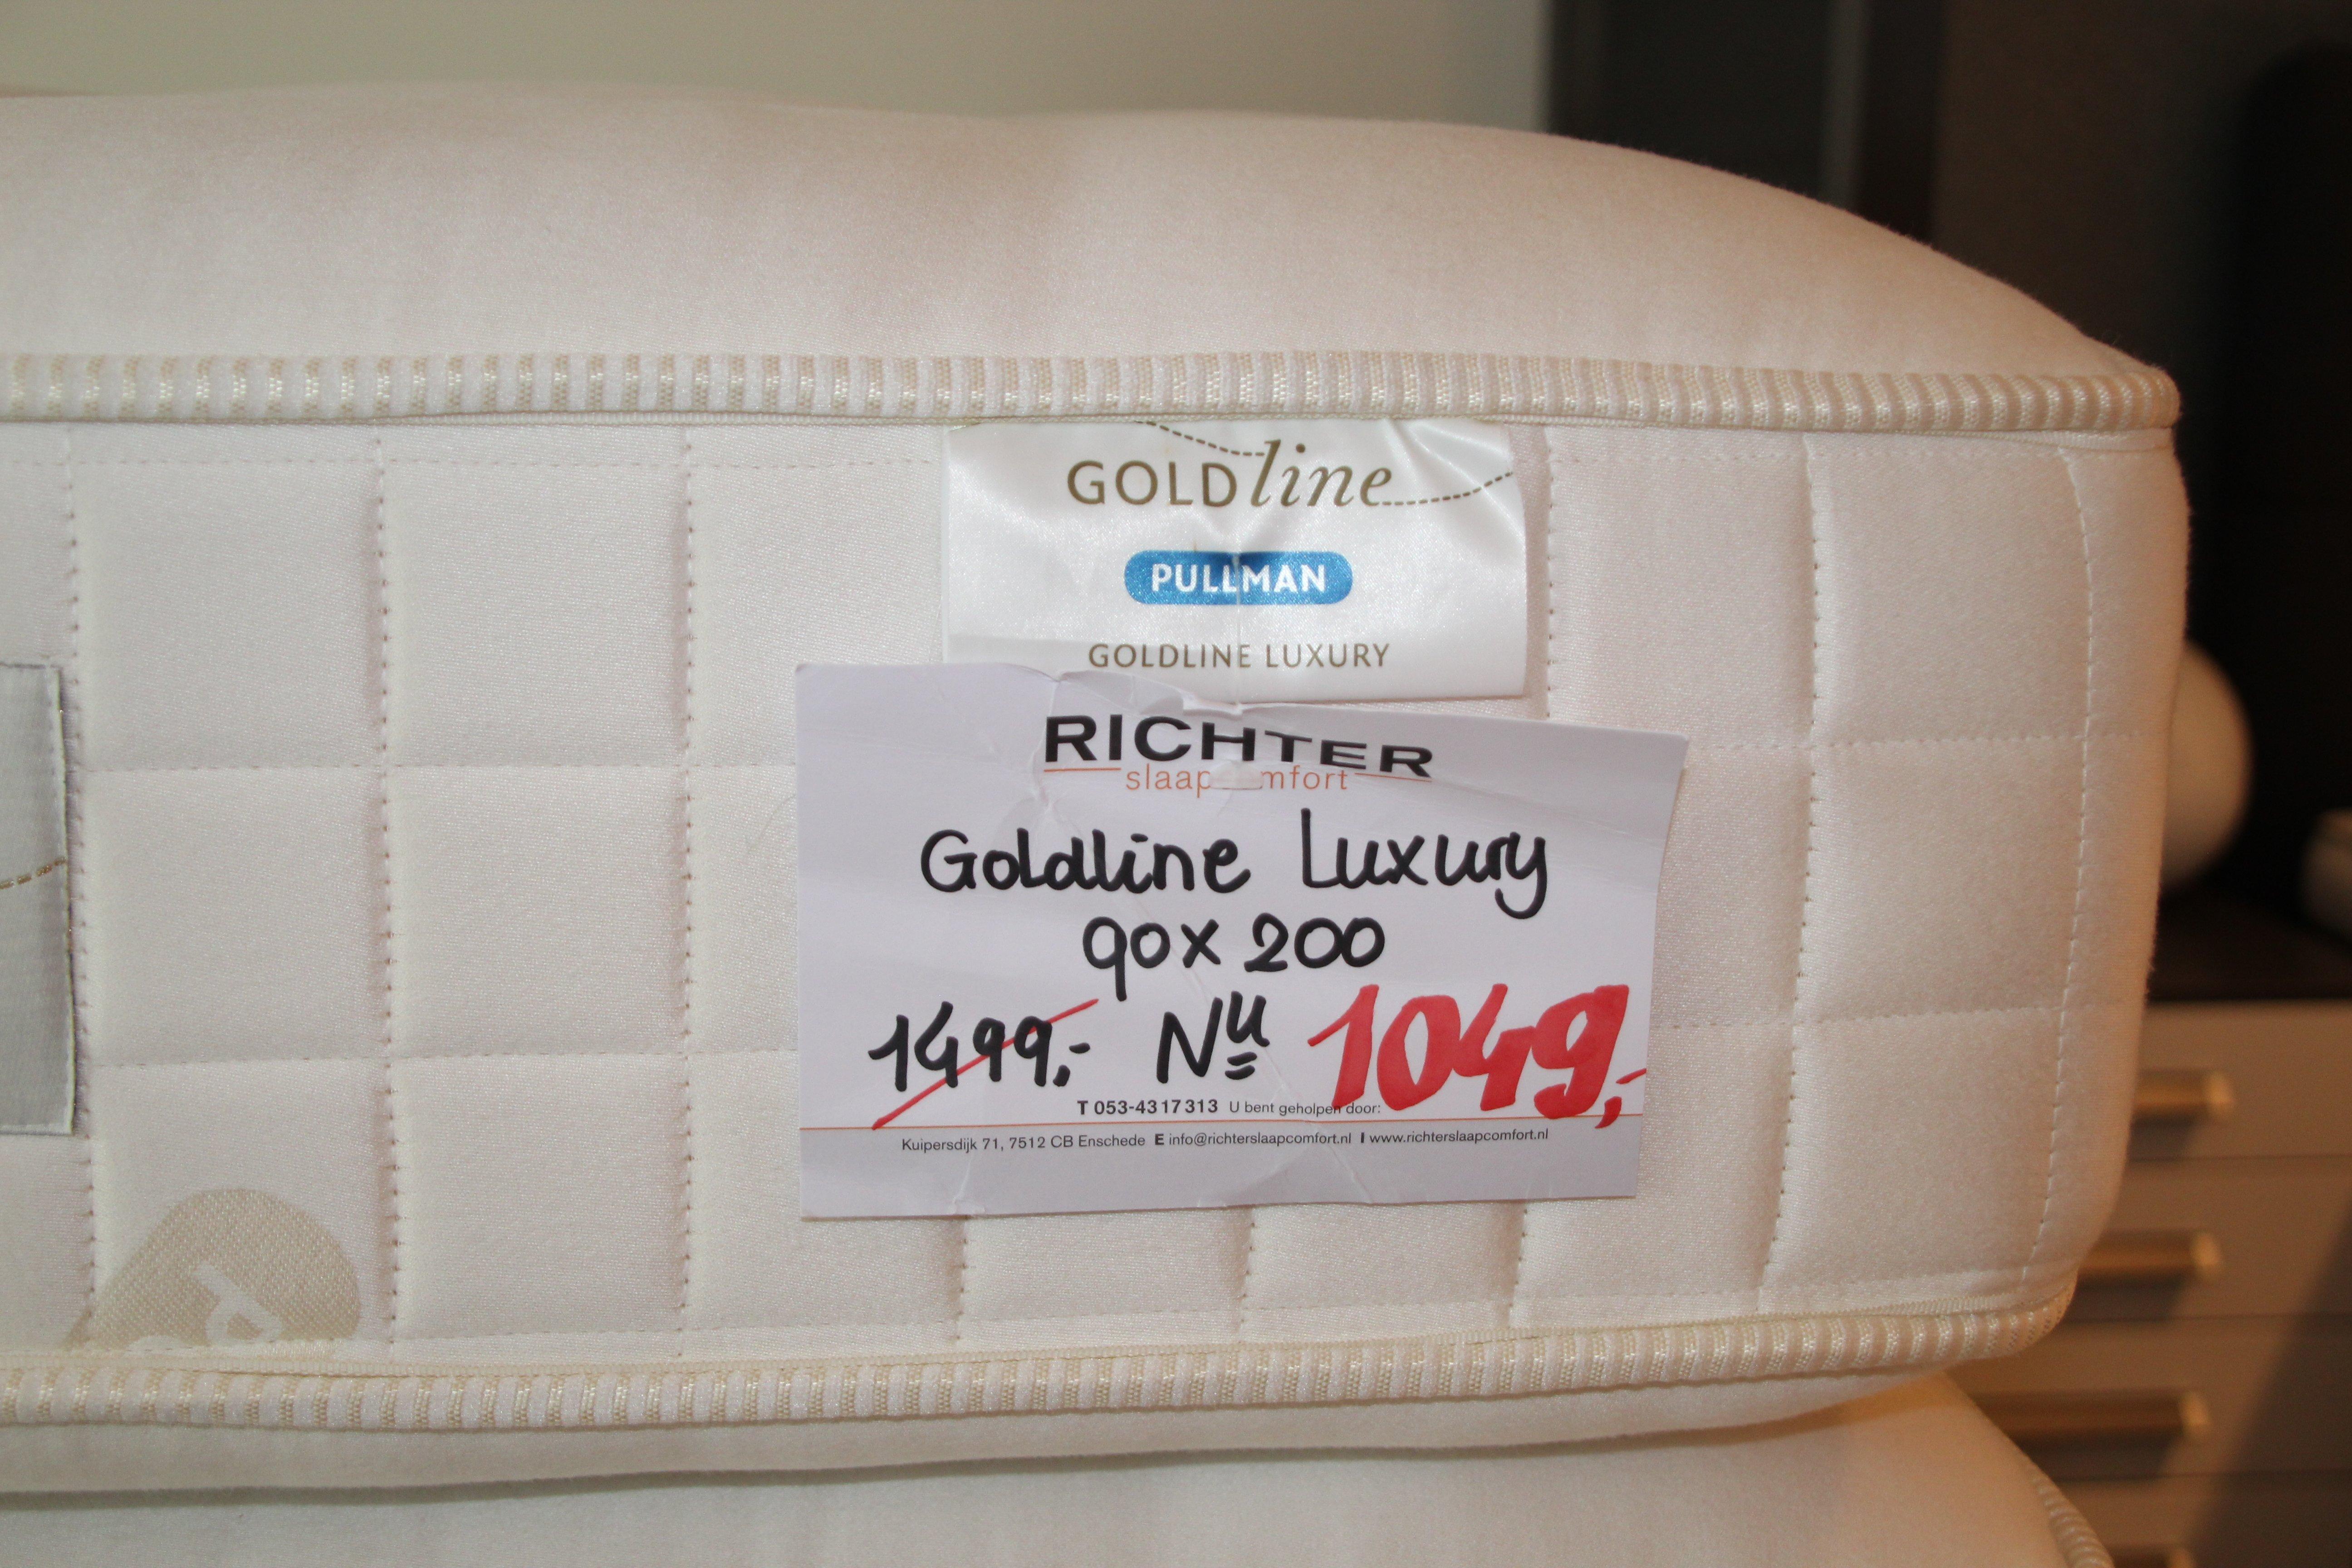 Pullman Matras Outlet : Matras pullman goldline luxury richter slaapcomfort